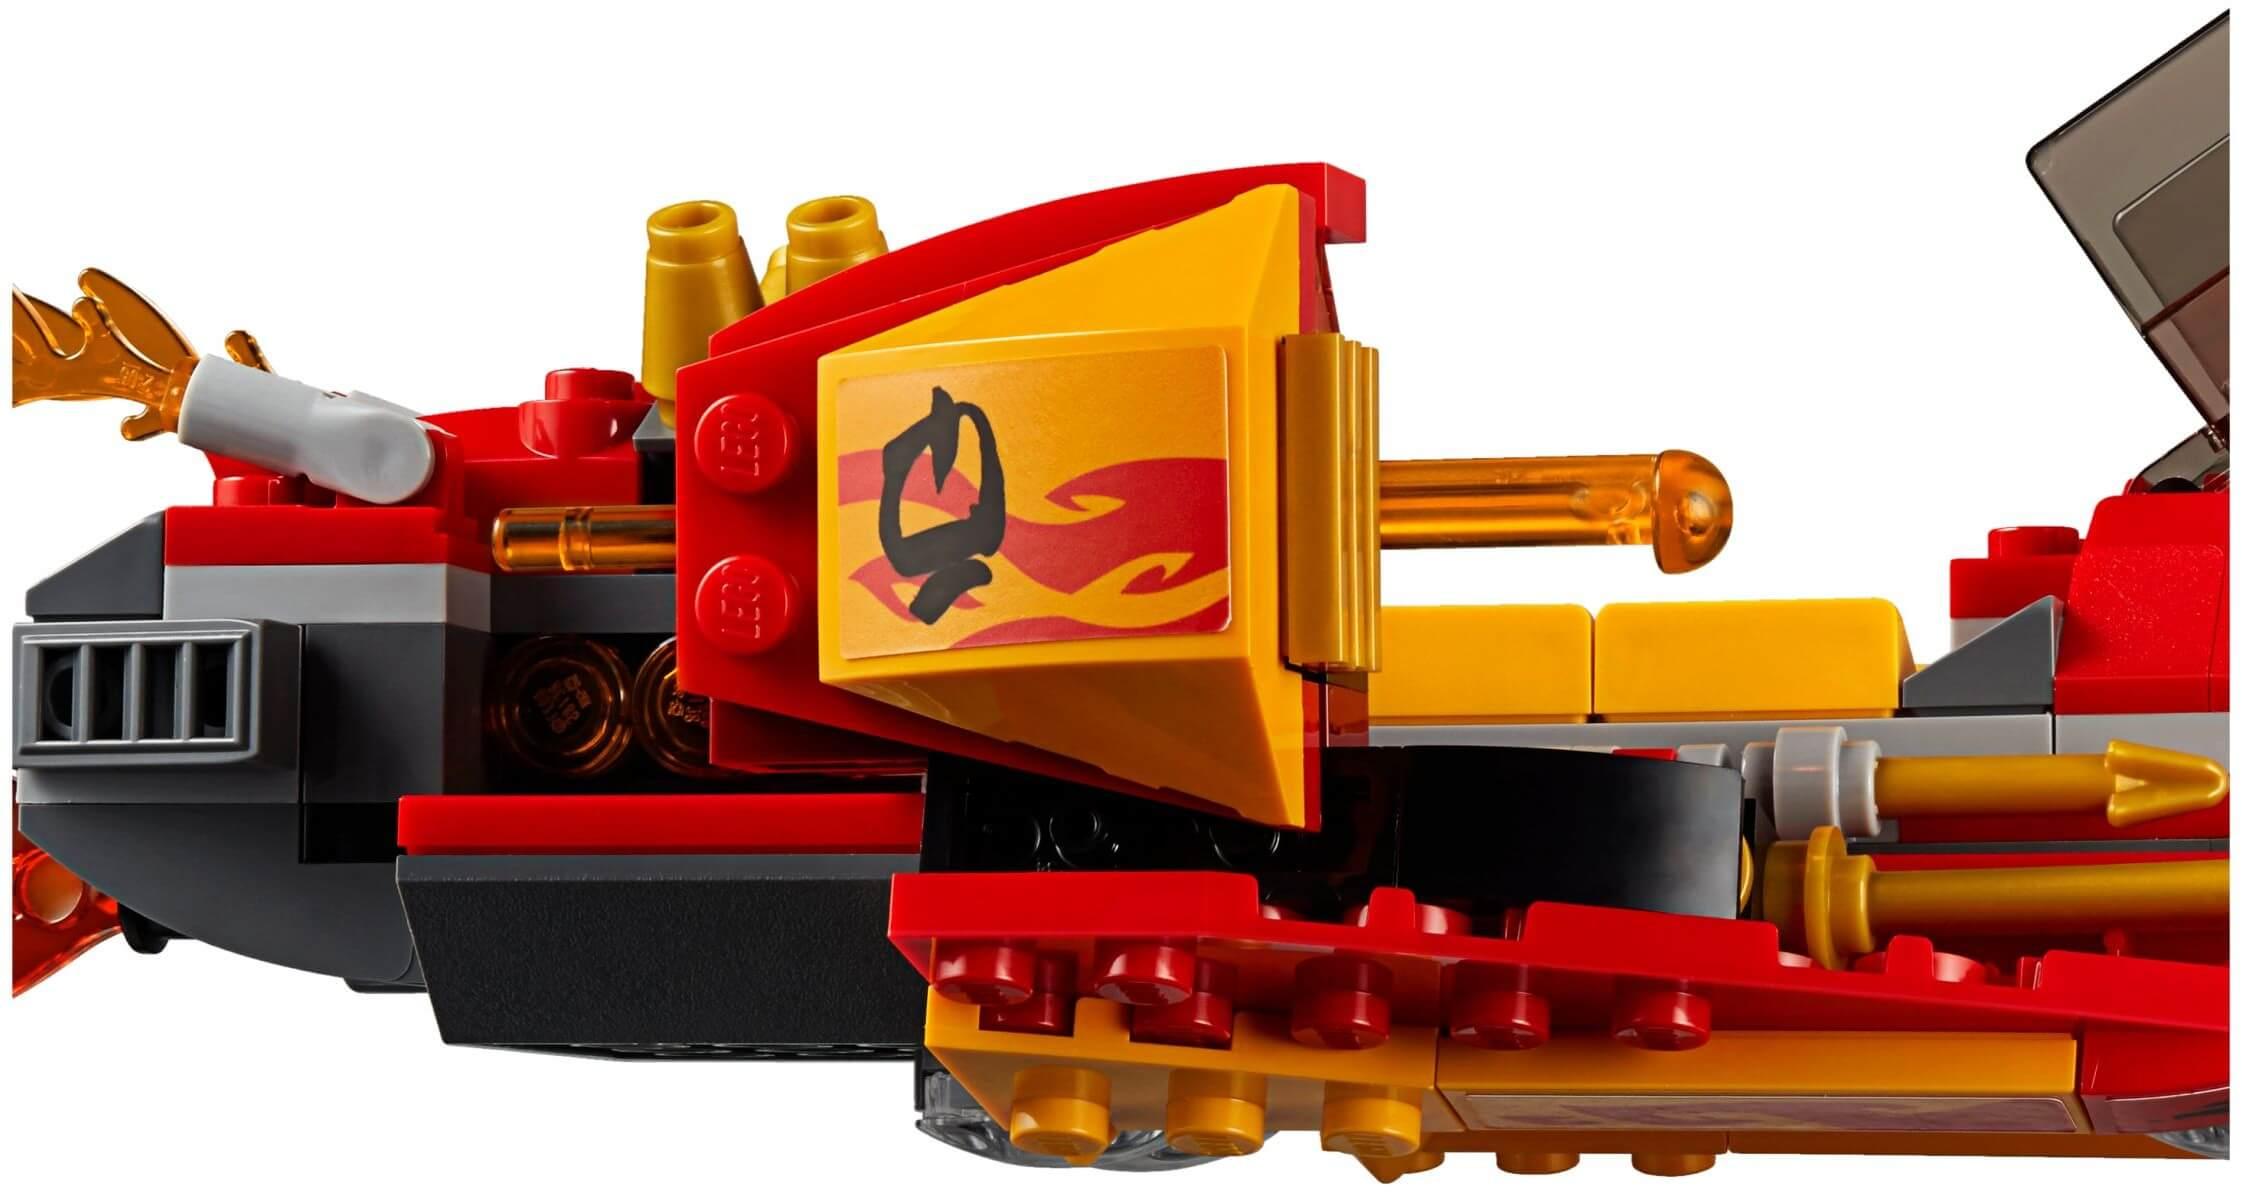 Mua đồ chơi LEGO 70638 - LEGO Ninjago 70638 - Siêu Thuyền Katana V11 (LEGO Ninjago 70638 Katana V11)